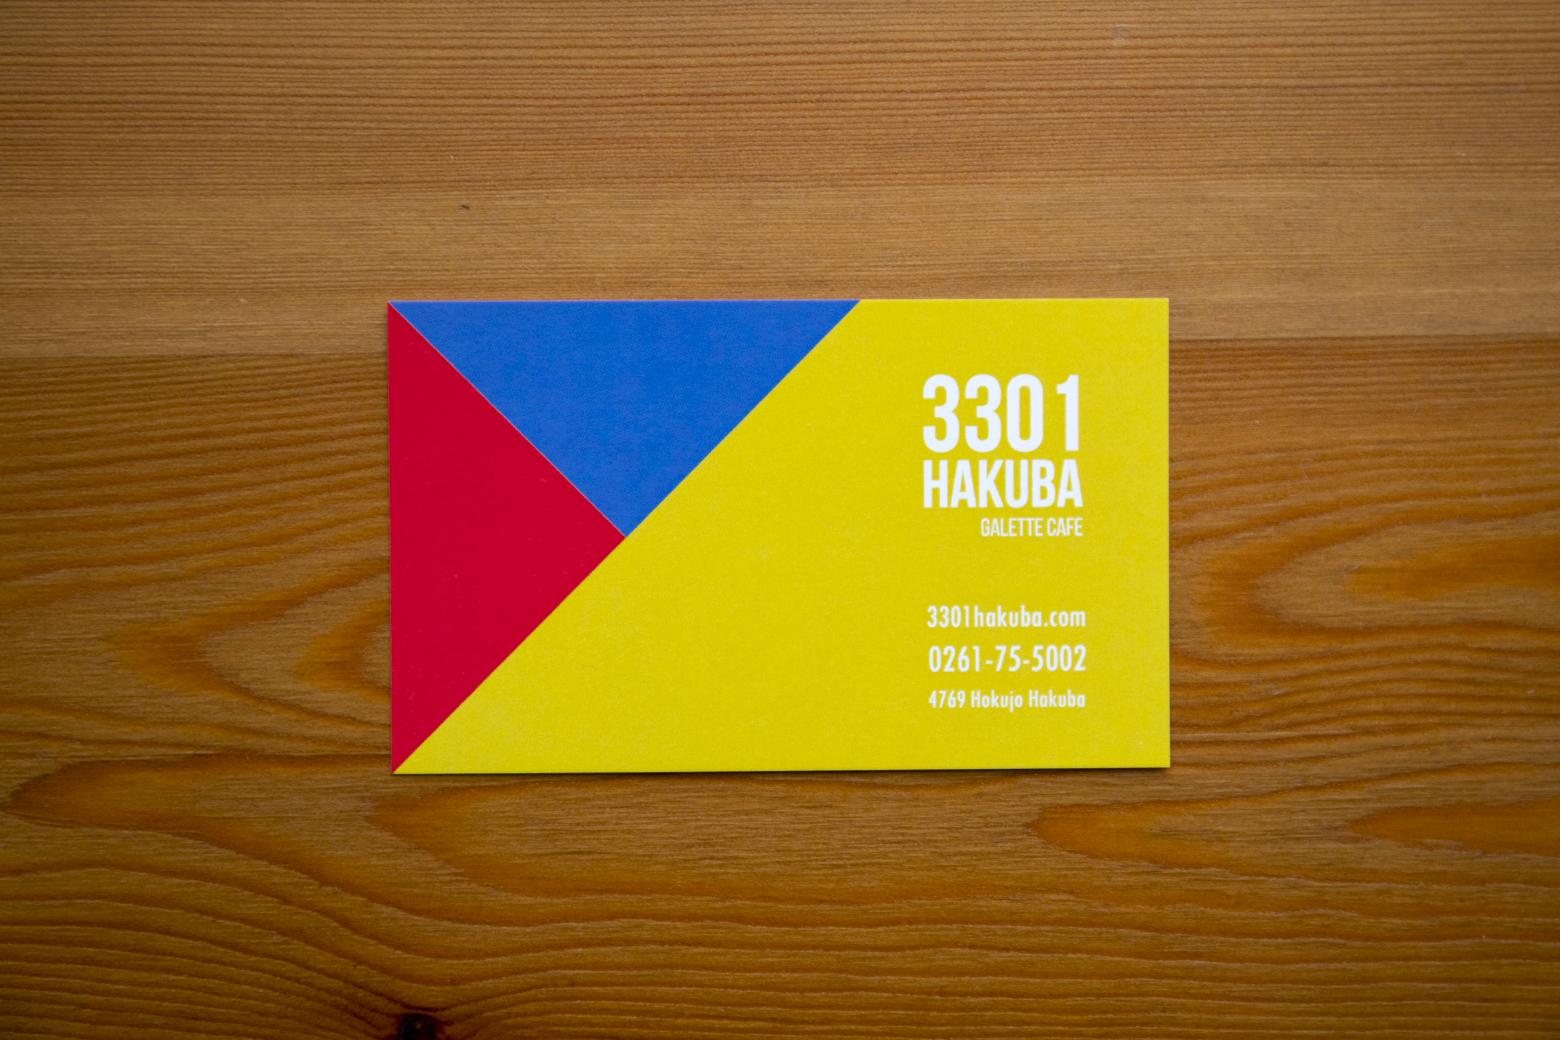 3301hakubaのショップカード